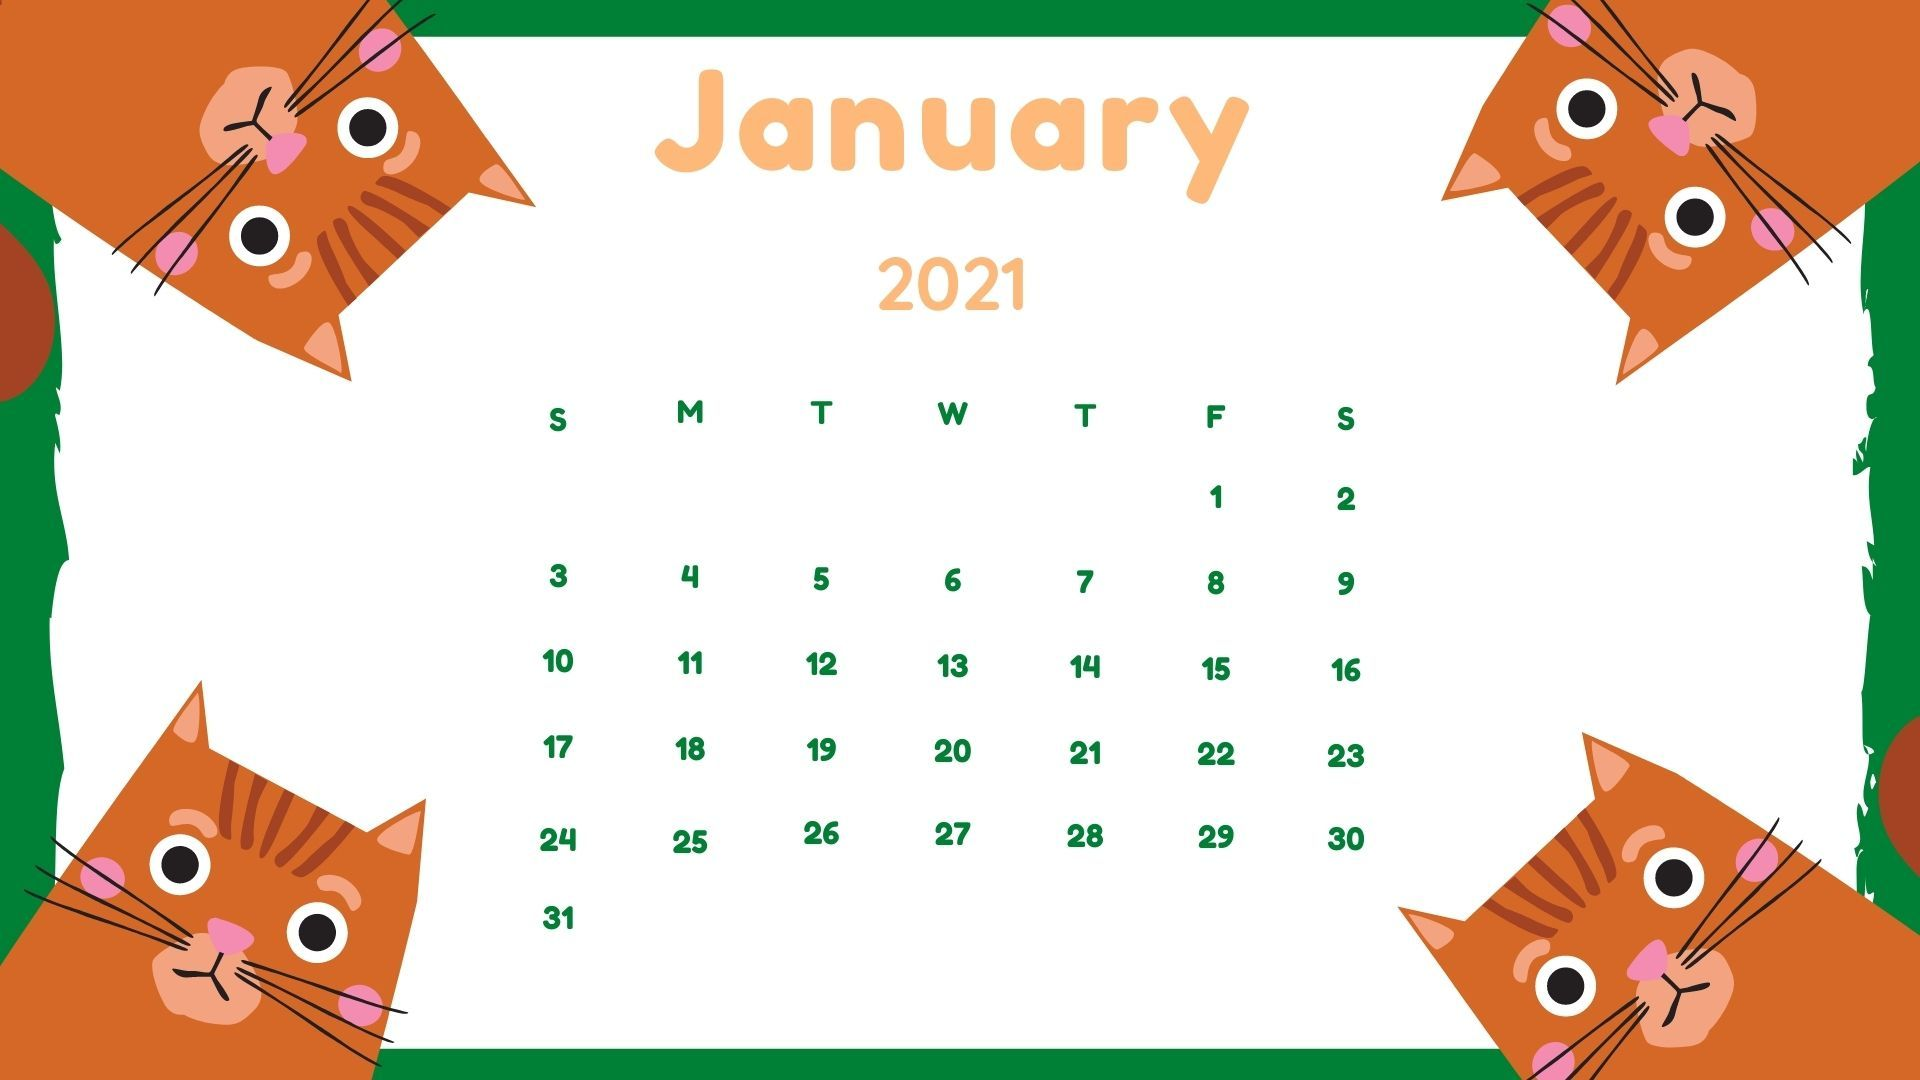 download January 2021 HD calendar wallpaper printable 1920x1080